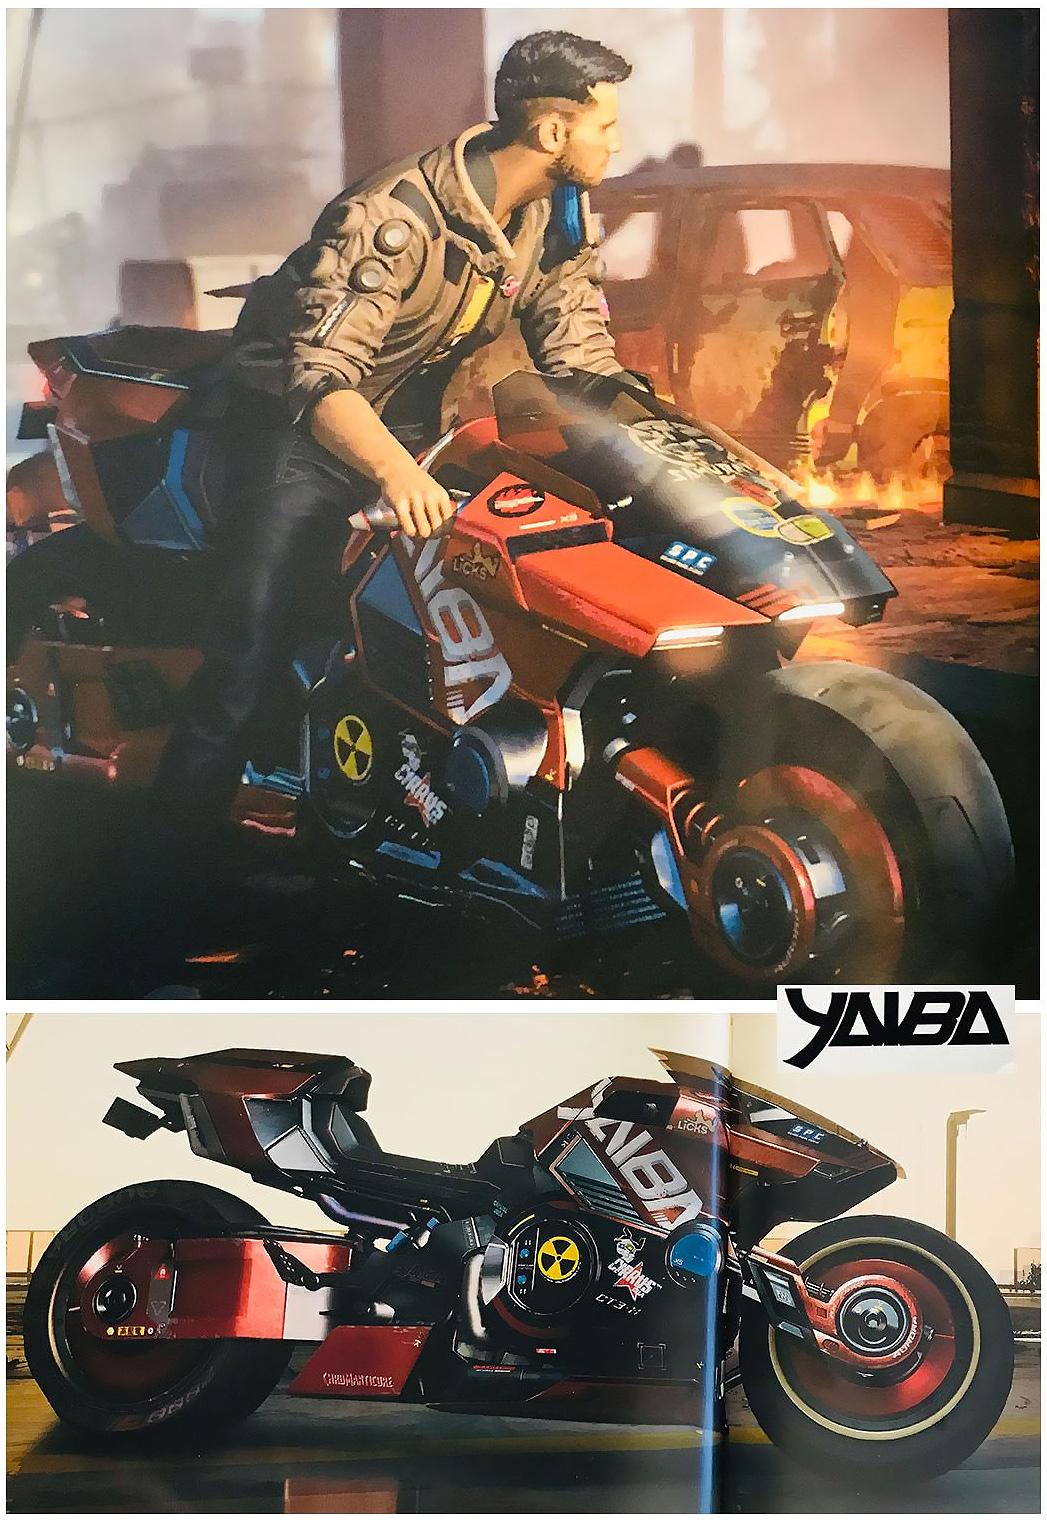 мотоцикл cyberpunk2077 yaiba